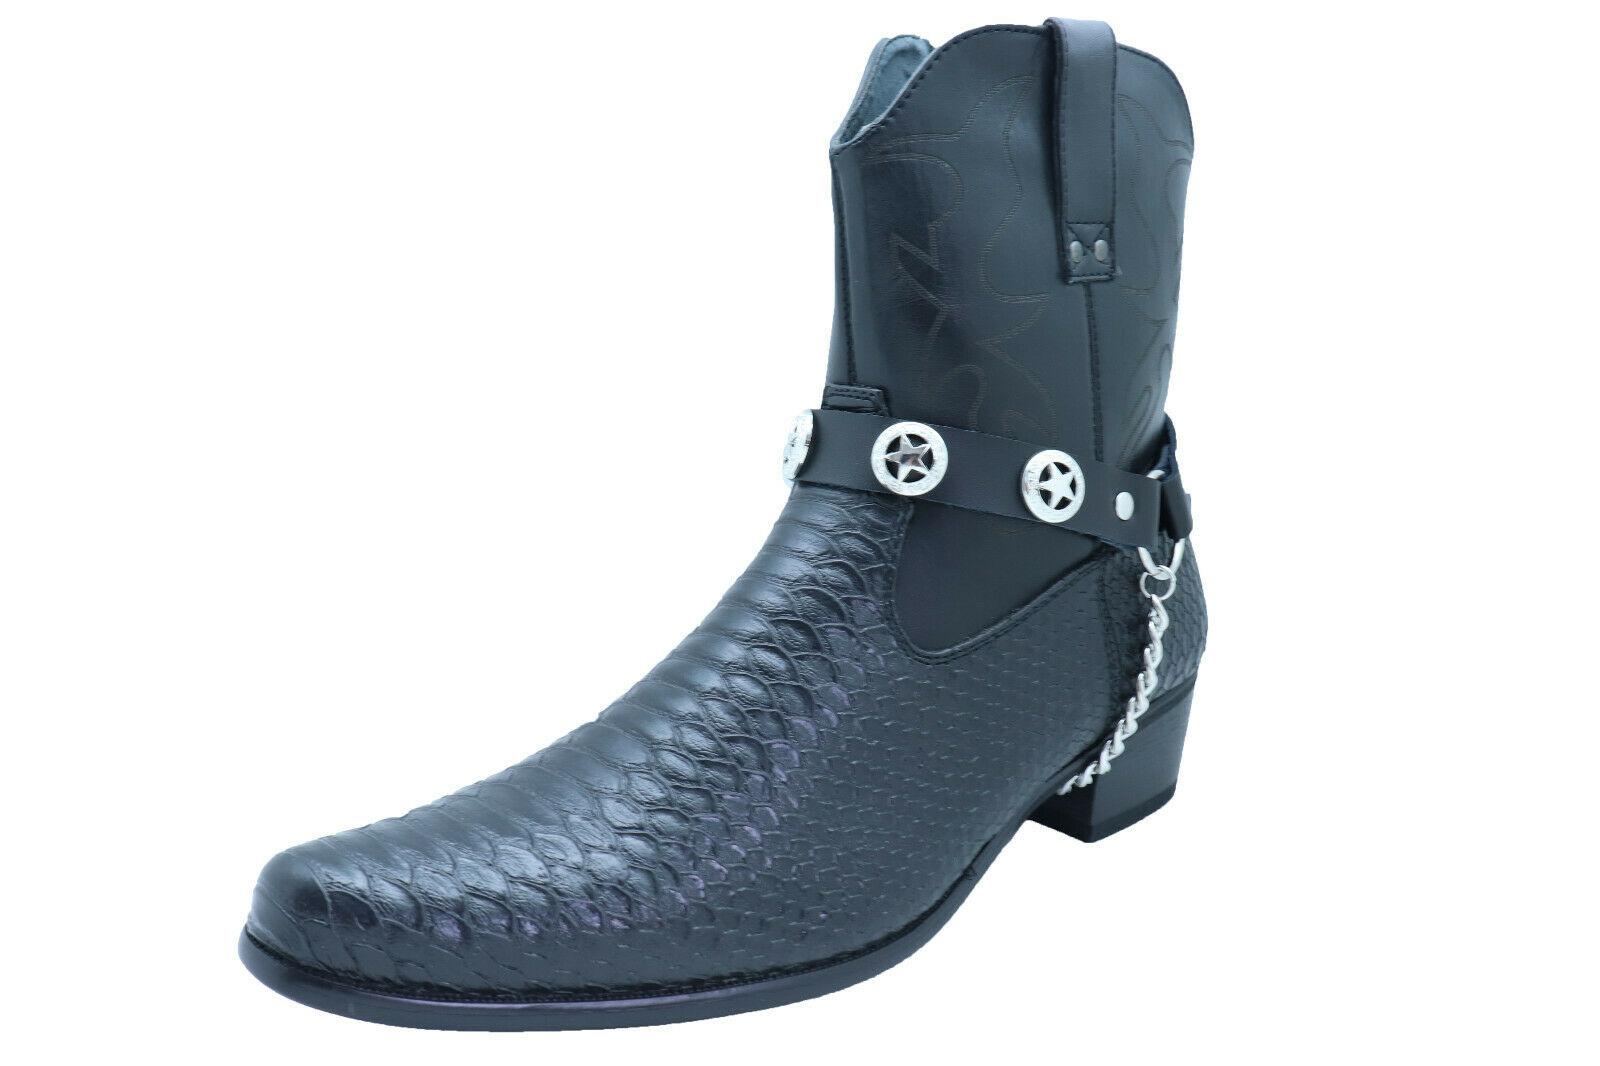 Biker Men Western Boot Silver Chain Black 2 Straps Texas Lone Star Charm Rocker